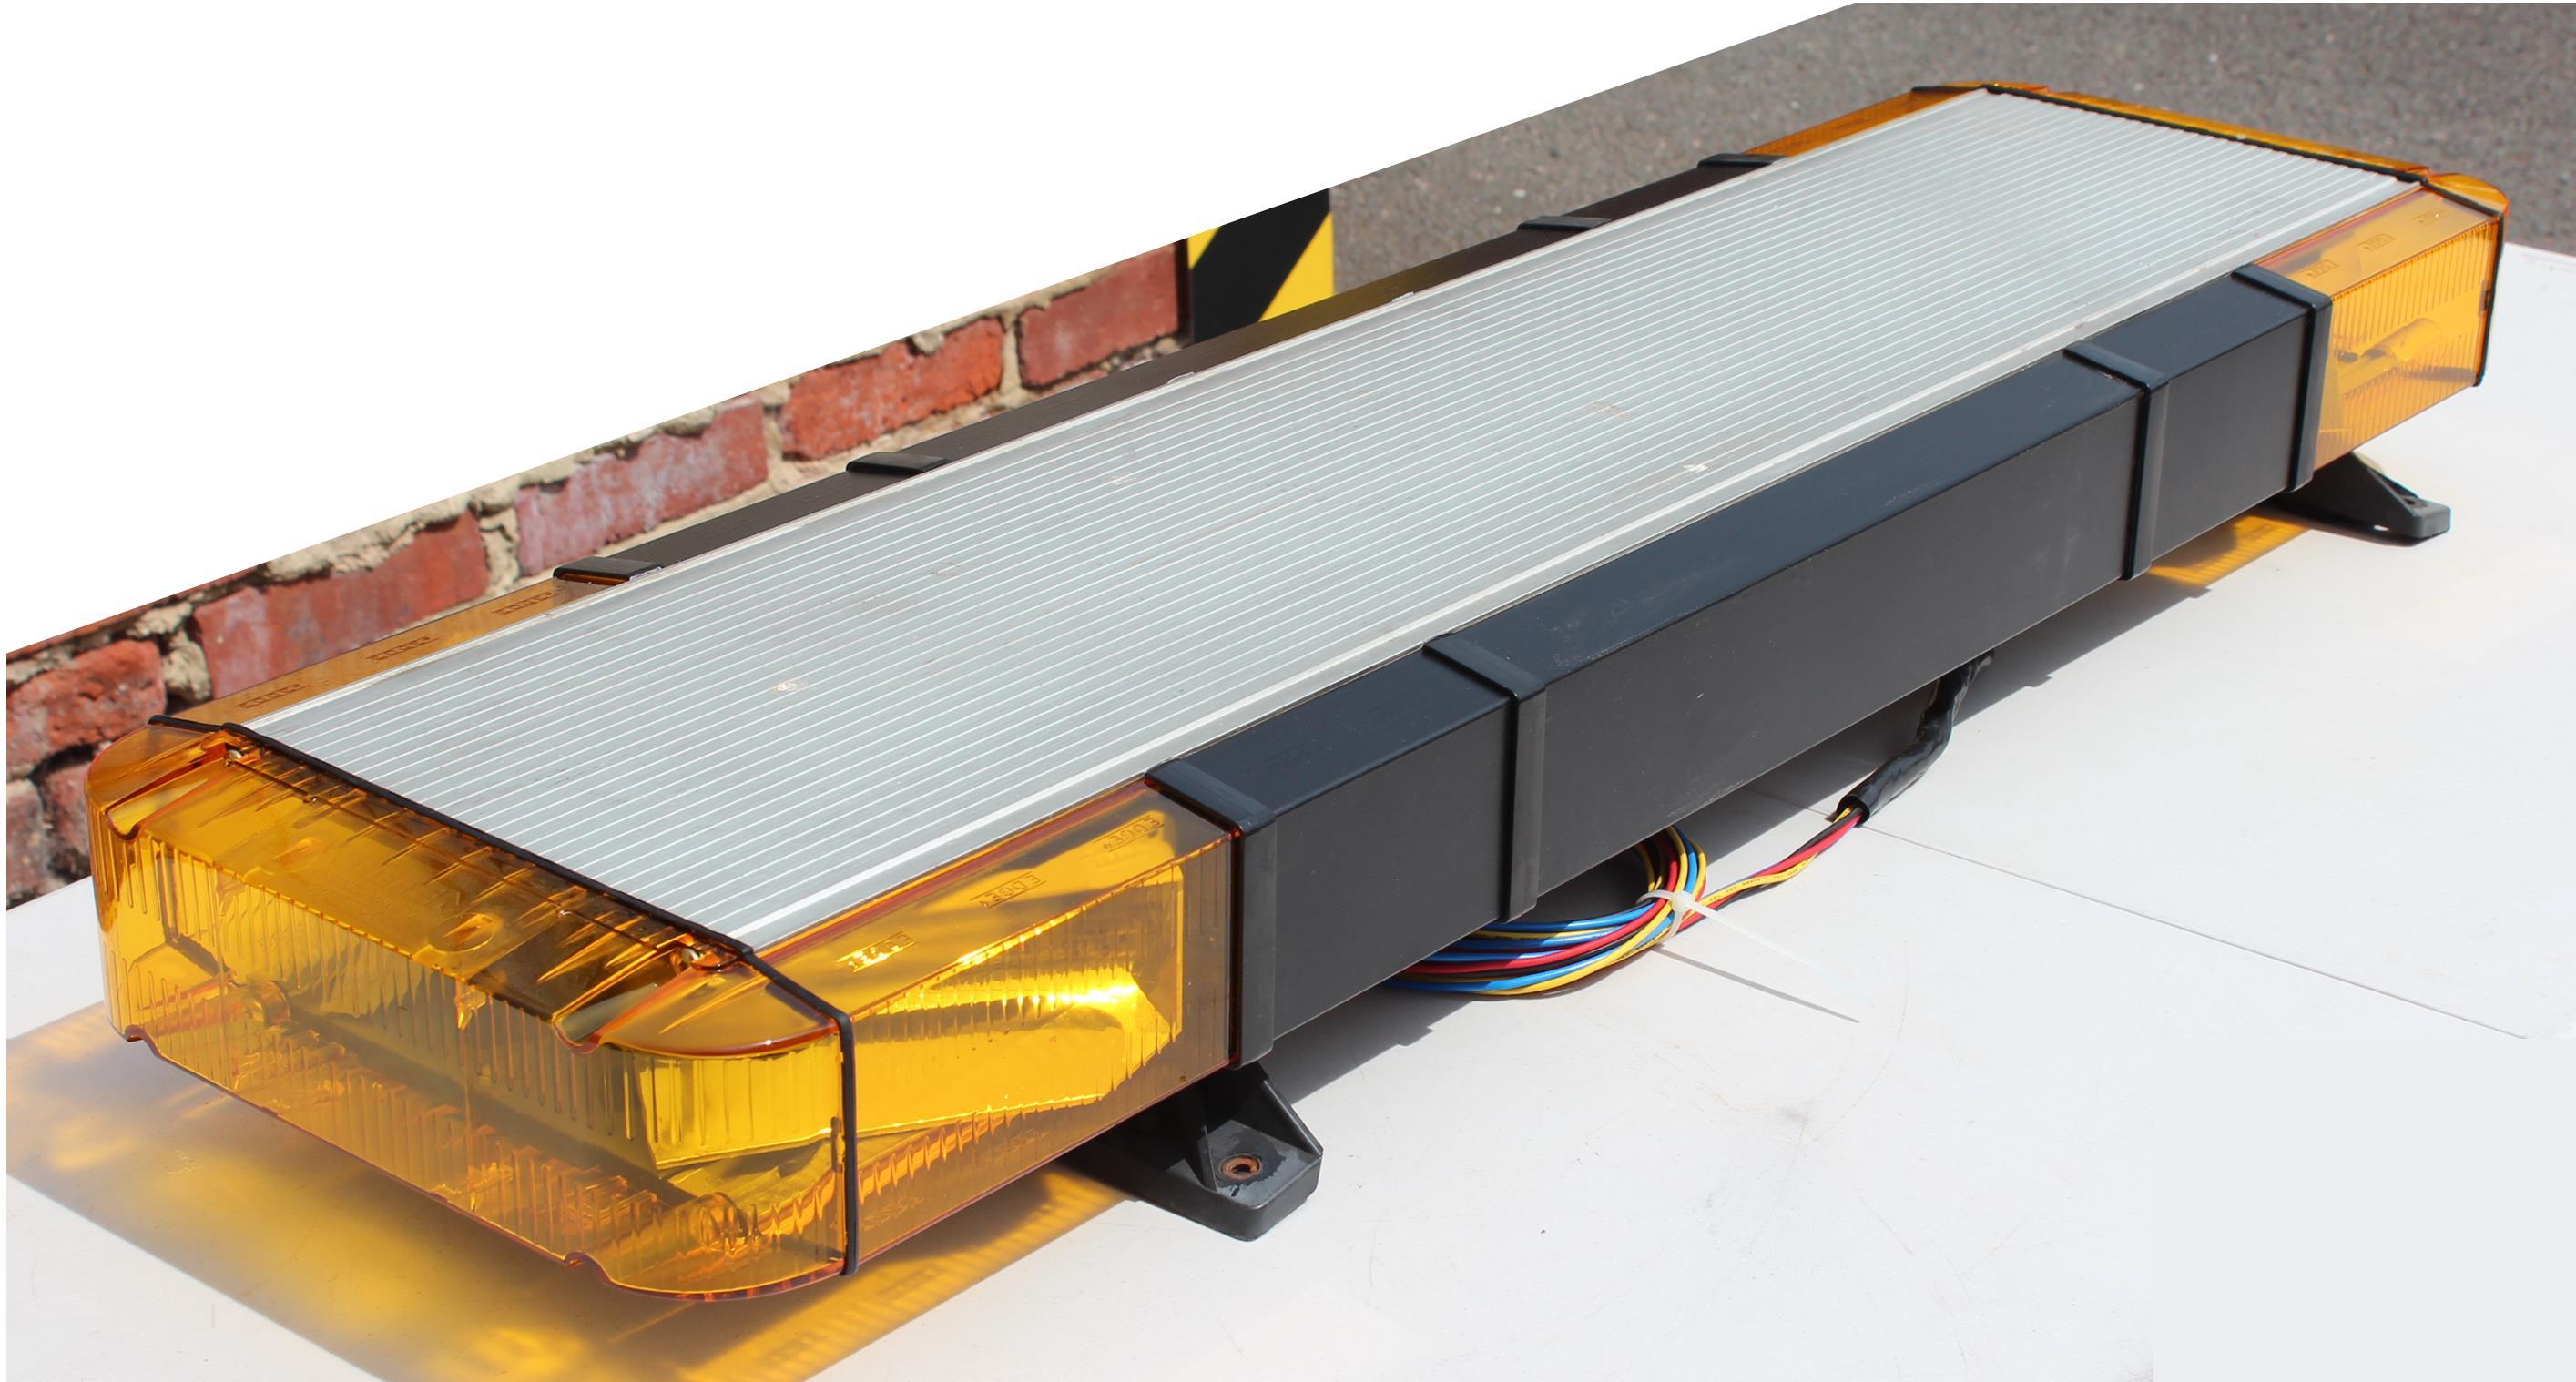 Edge01?maxwidth=950&maxheight=600 whelen edge ultra lightbar Strobe Light Wiring Detail at crackthecode.co